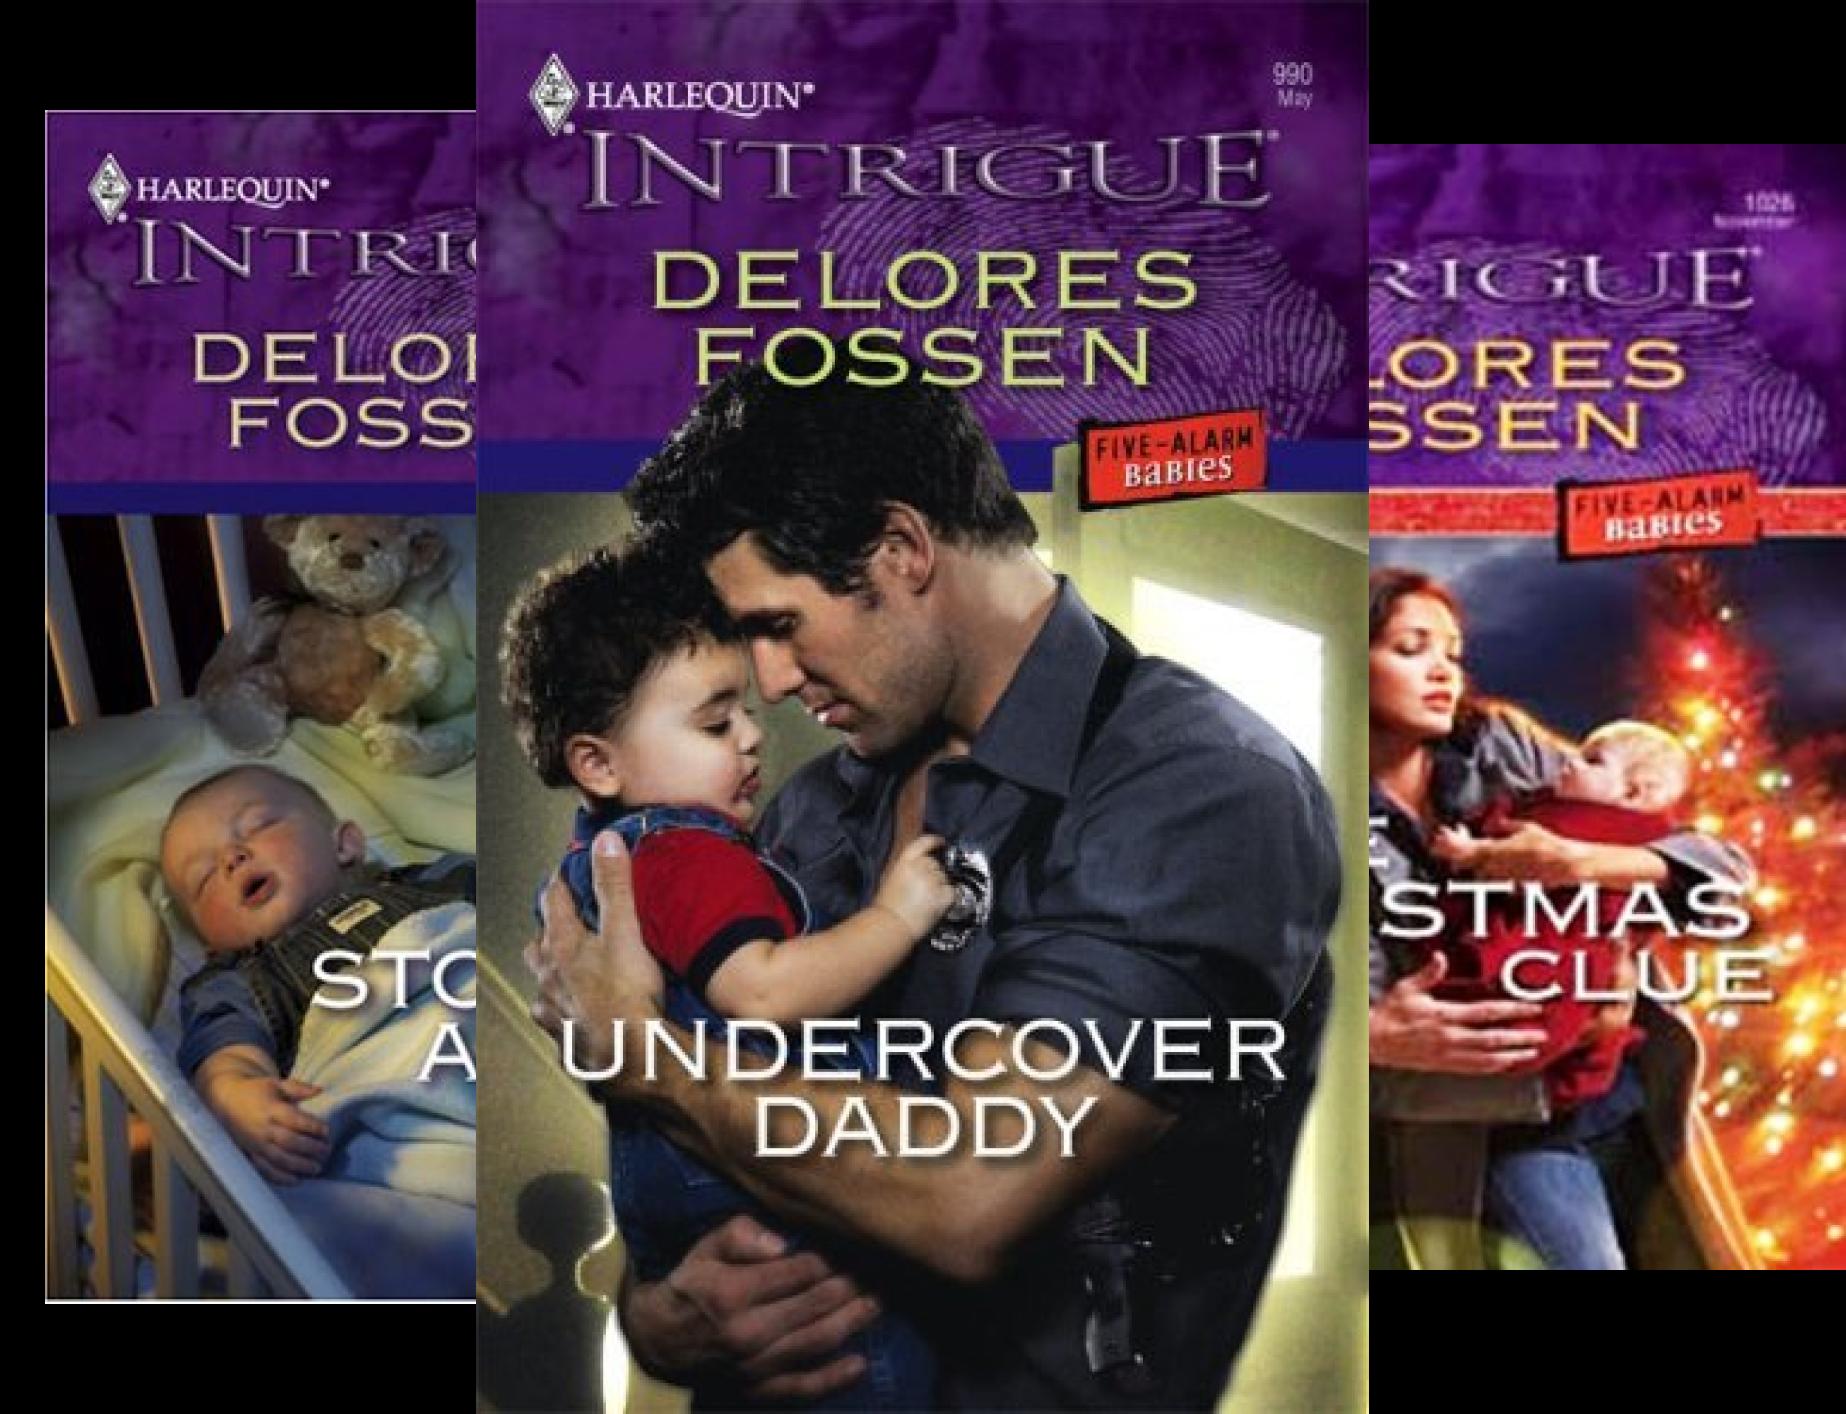 Five-Alarm Babies (5 Book Series)